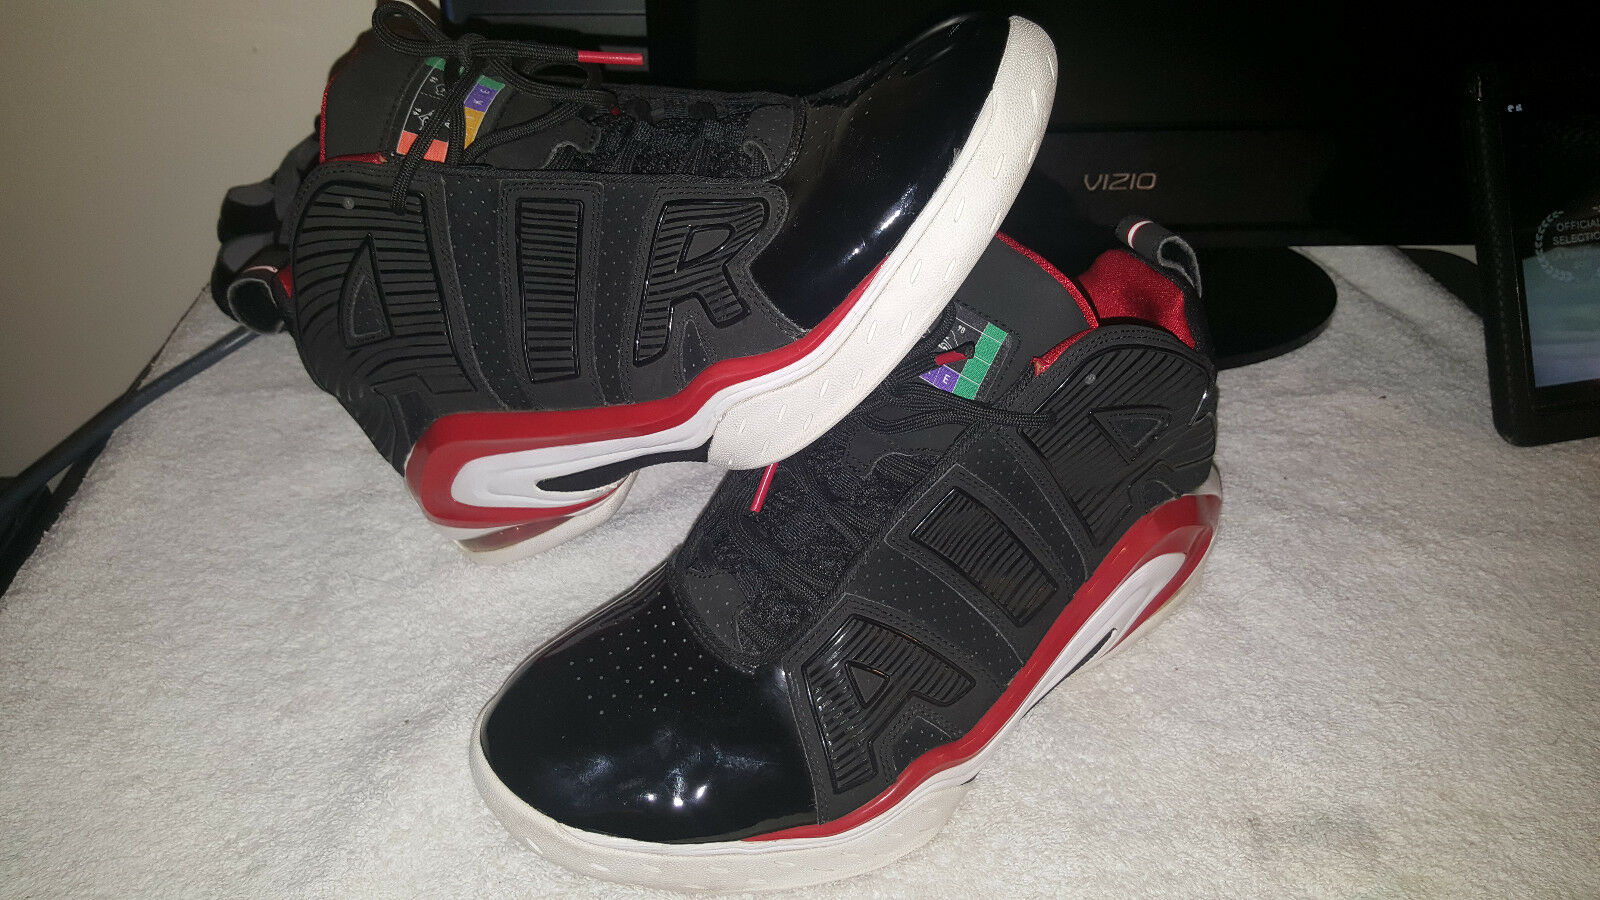 Nike Air Max A Lot Sneaker 2009 Pippen Basketball Bulls Men 10.5 Multi Athletic